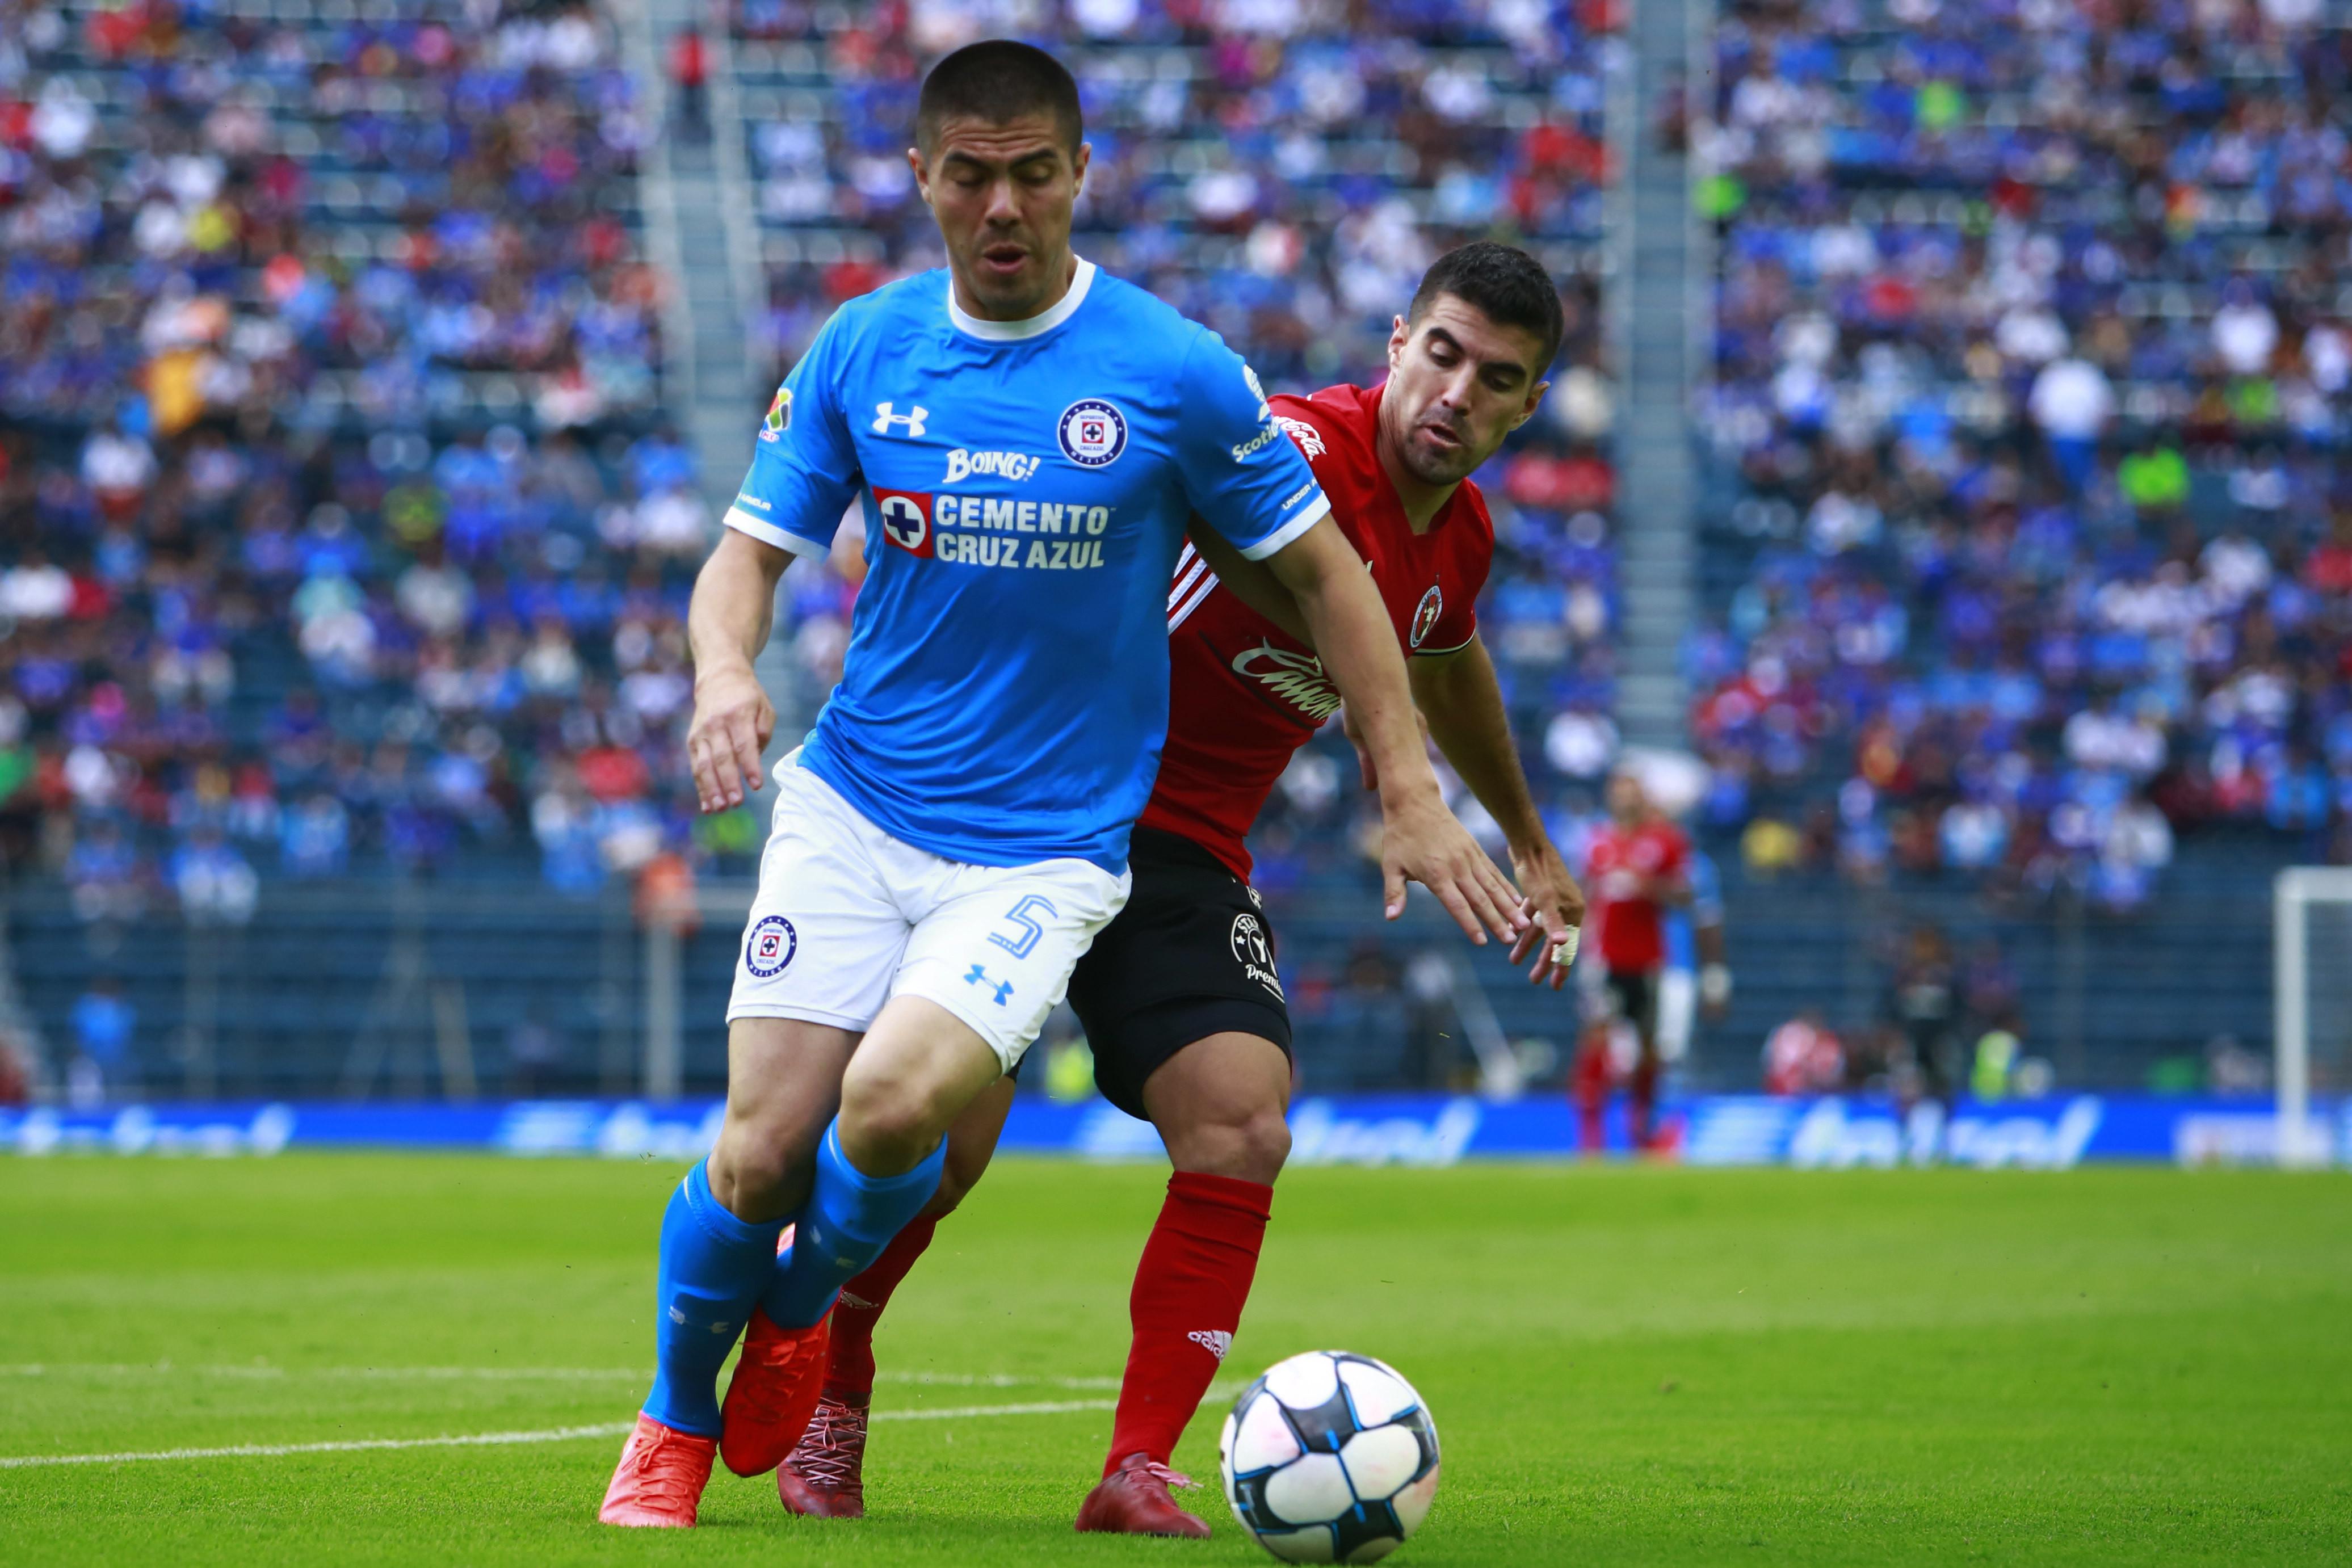 Cruz Azul Xolos Jornada 1 A qué hora juega Cruz Azul A qué hora juega Cruz Azul vs Xolos A qué hora es el juego de Cruz Azul a qué hora juegan los Xolos vs Cruz Azul A qué hora juega Cruz Azul en la jornada 1